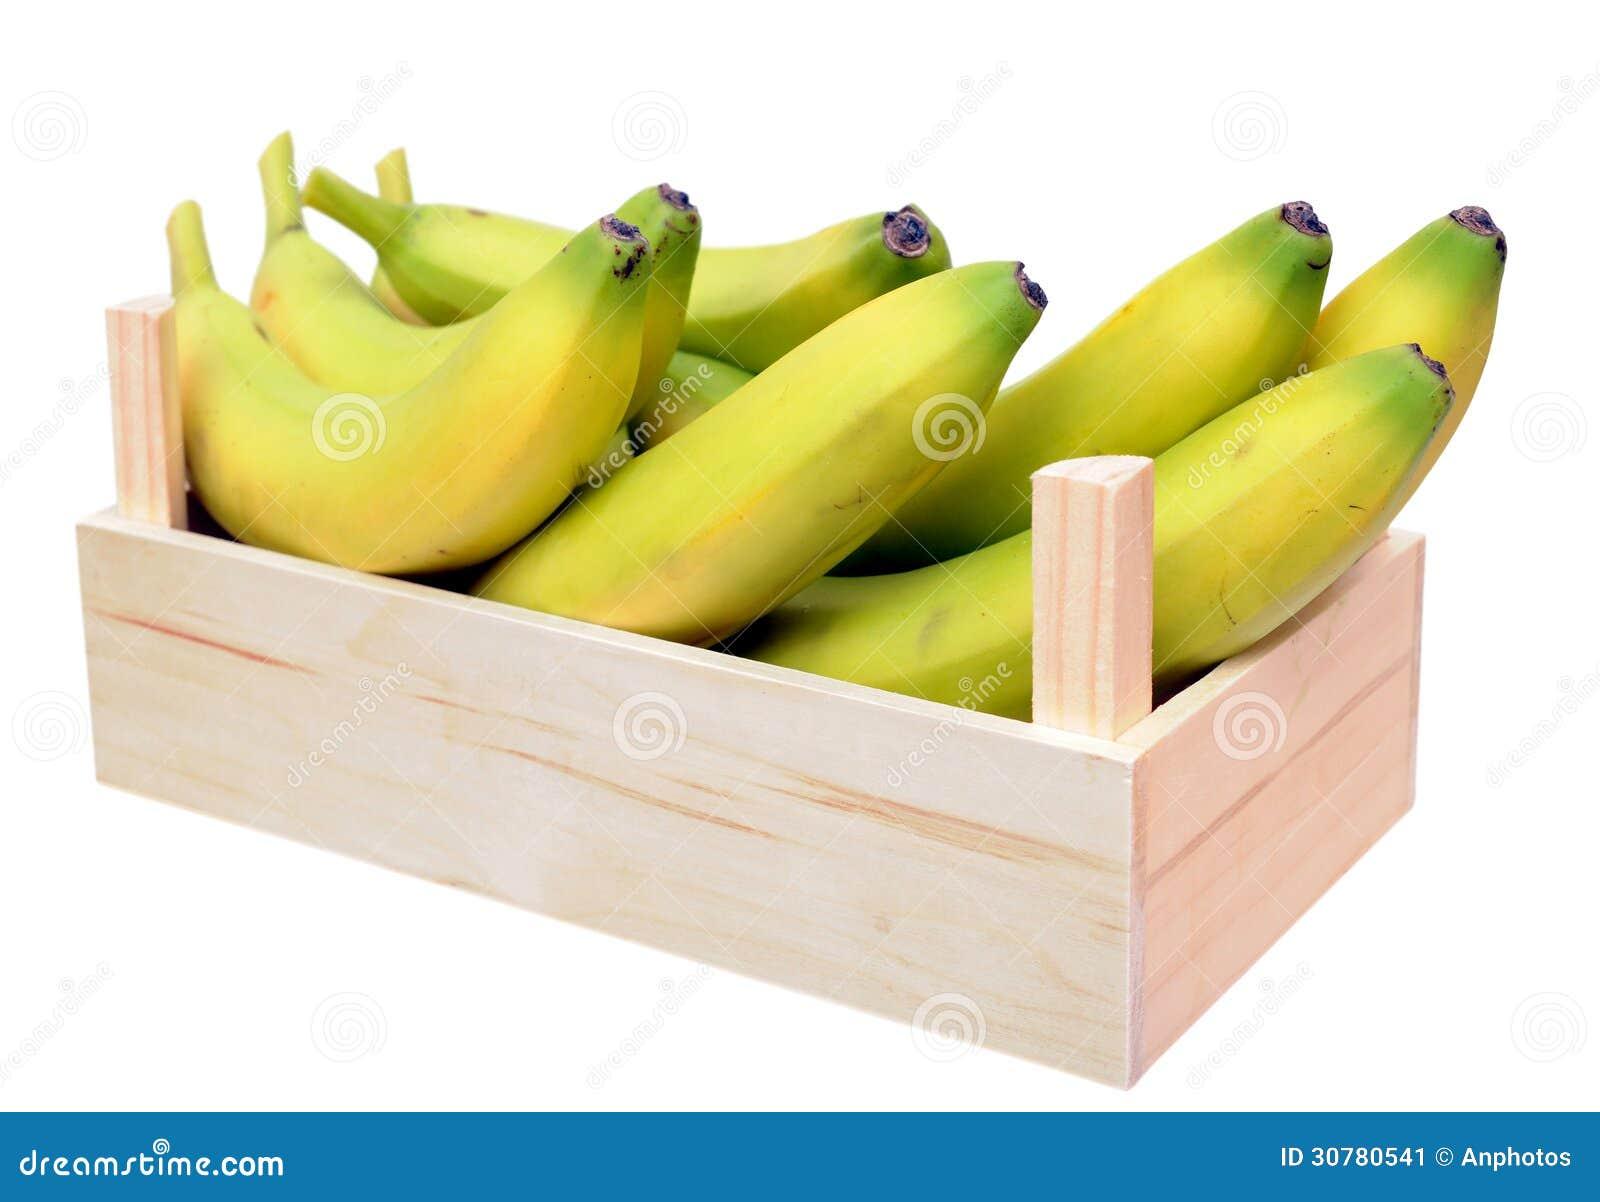 Young Ripe Banana Stock Image Image 30780541